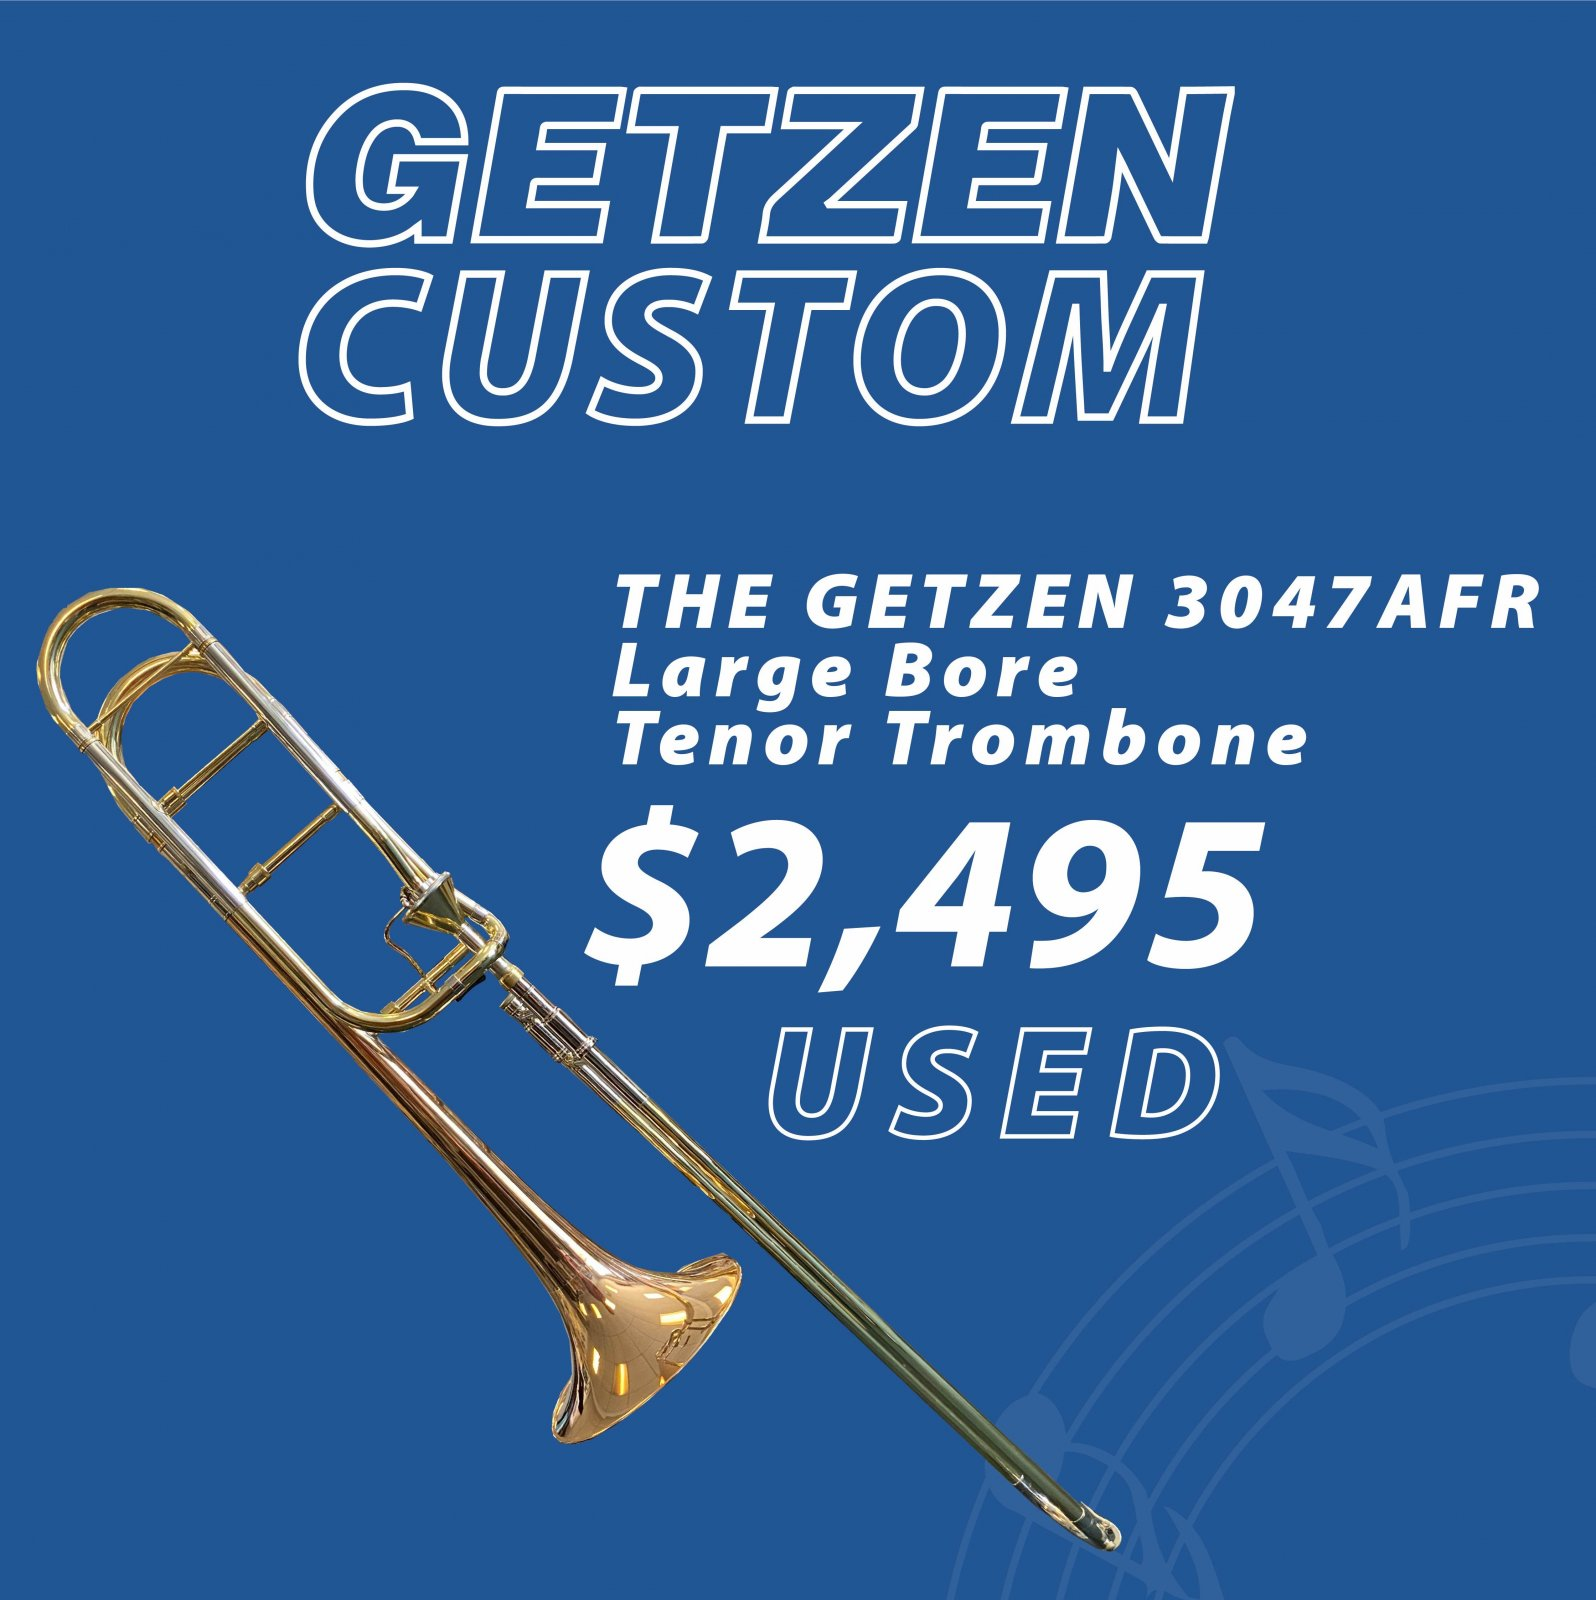 Getzen Custom 3047 AFR Tenor Trombone (used)